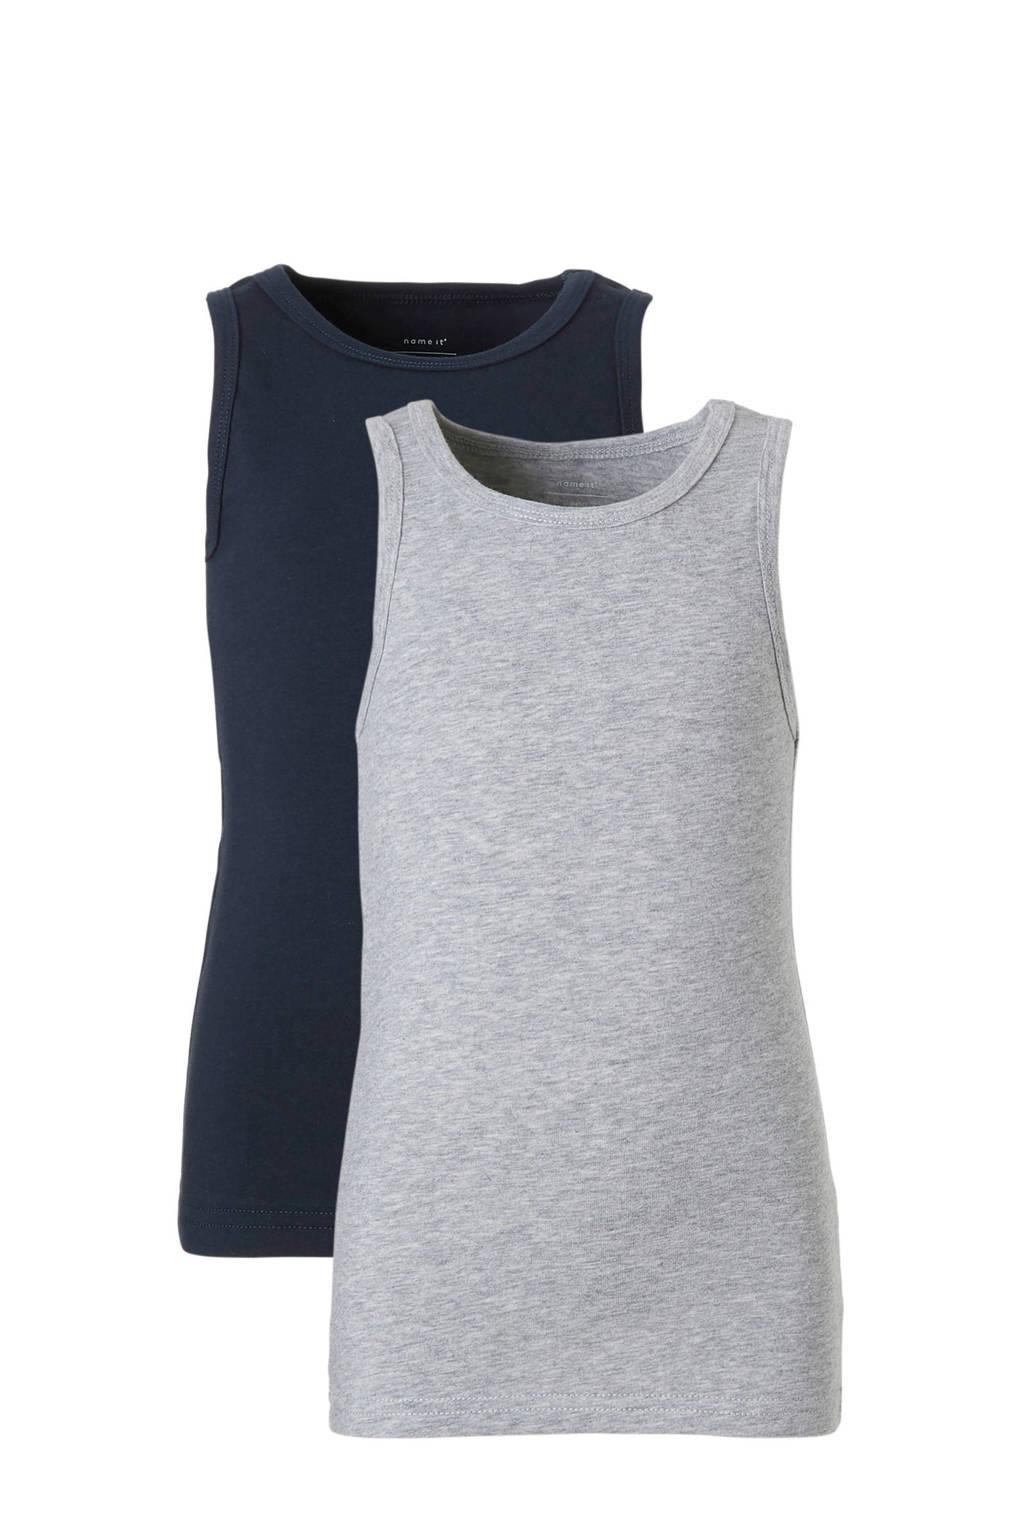 name it MINI hemd - set van 2, Donkerblauw/grijs